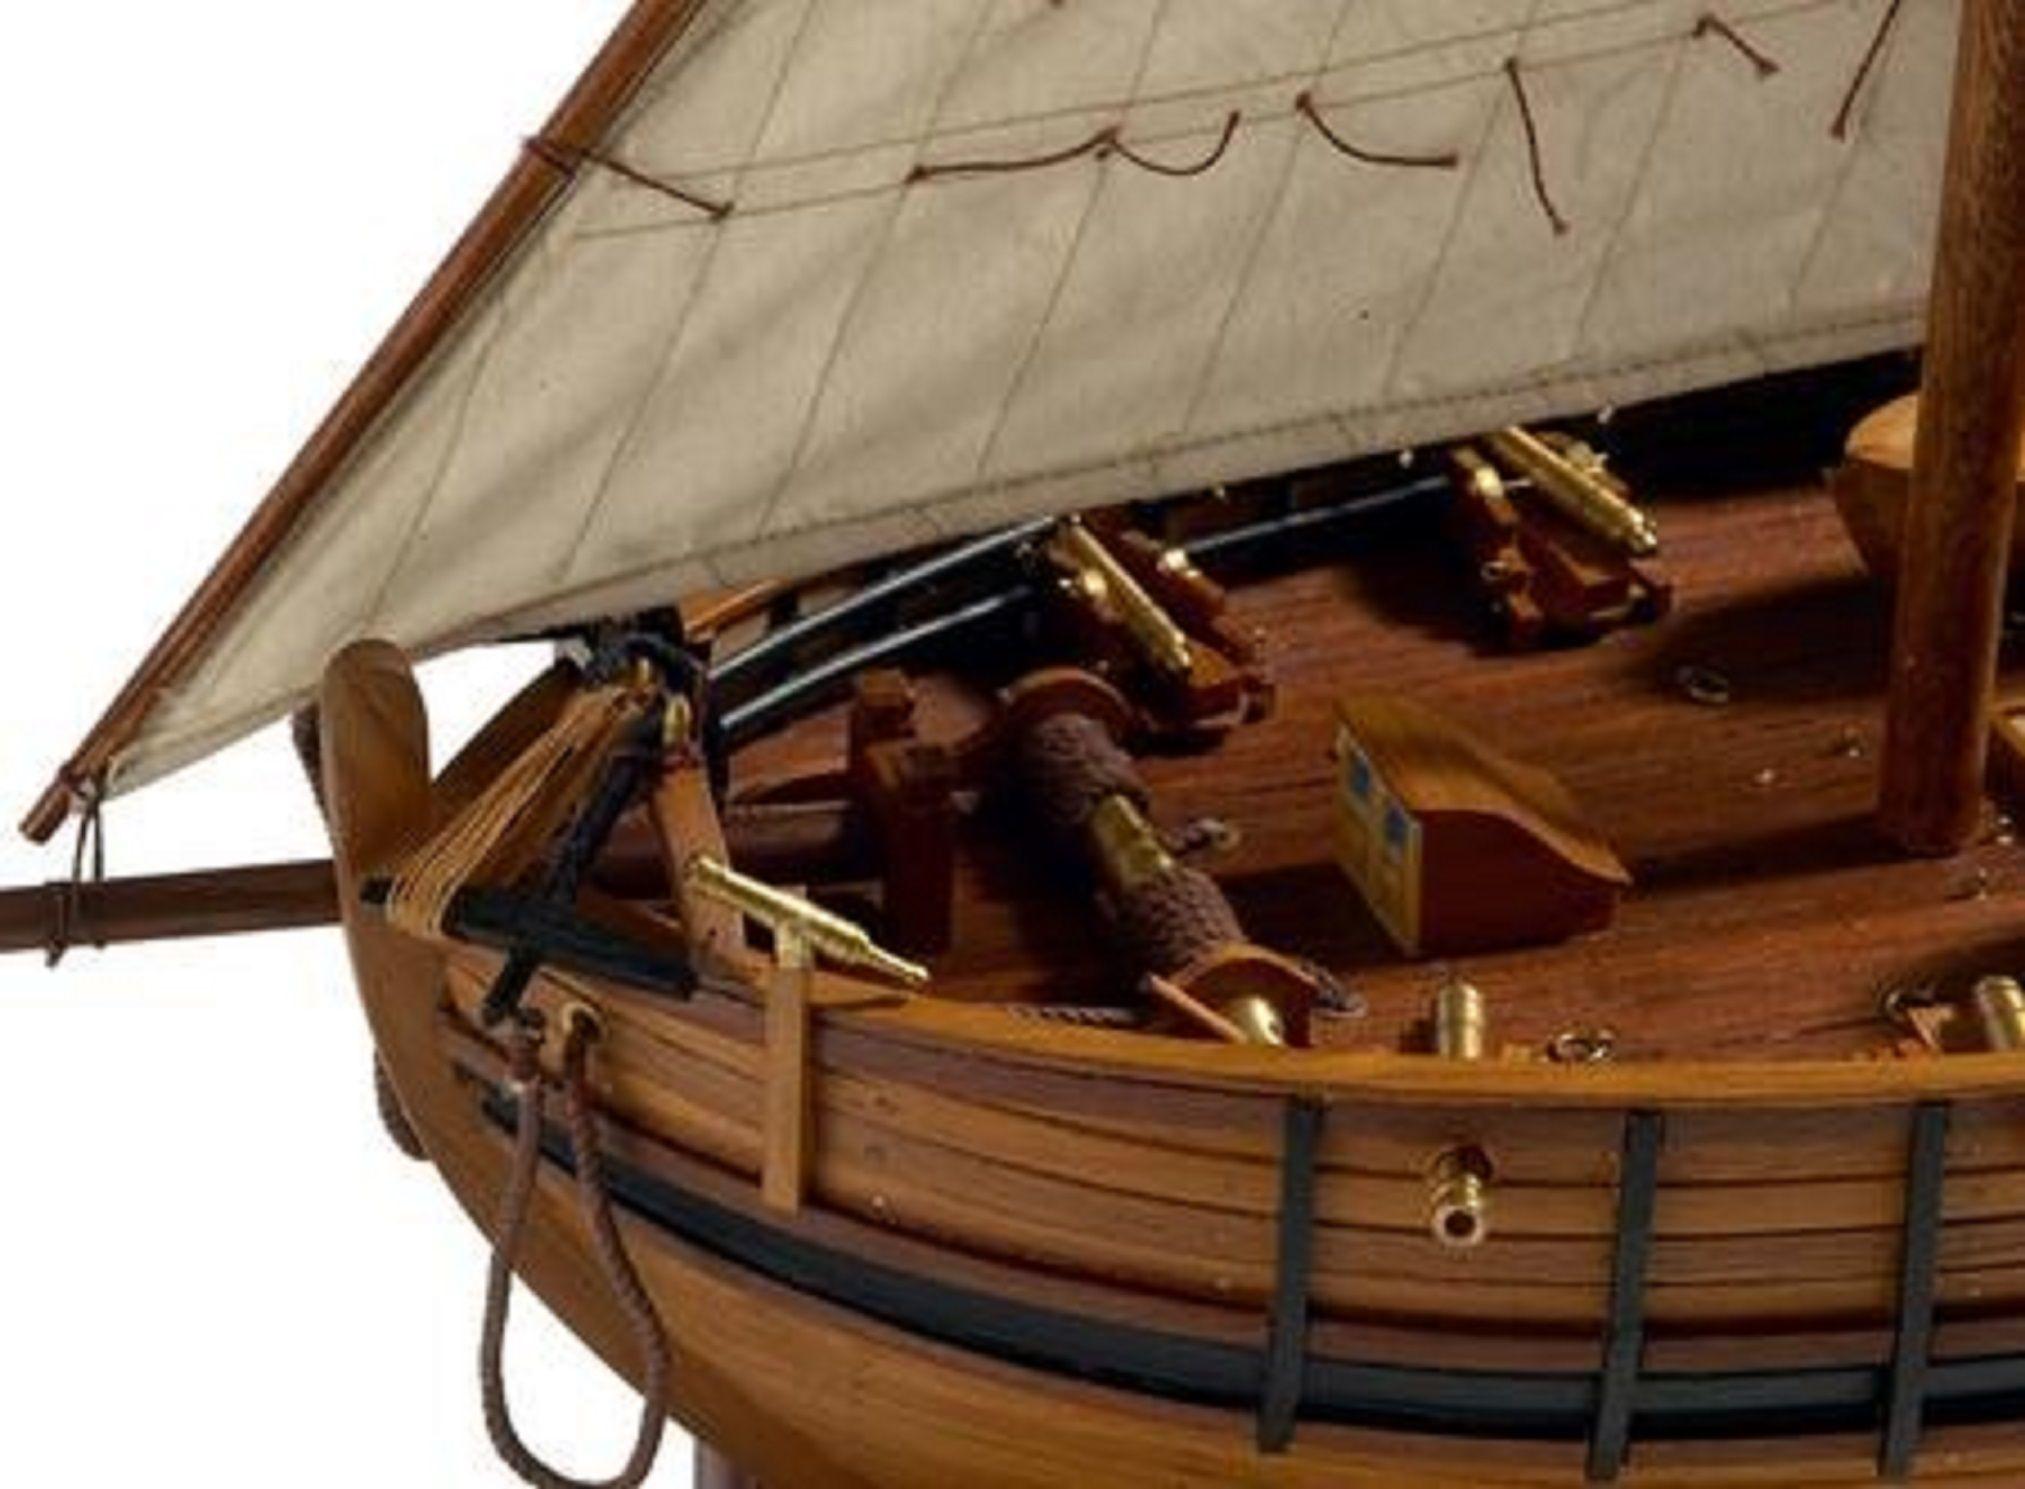 217-7201-Caravel-model-ship-Premier-Range